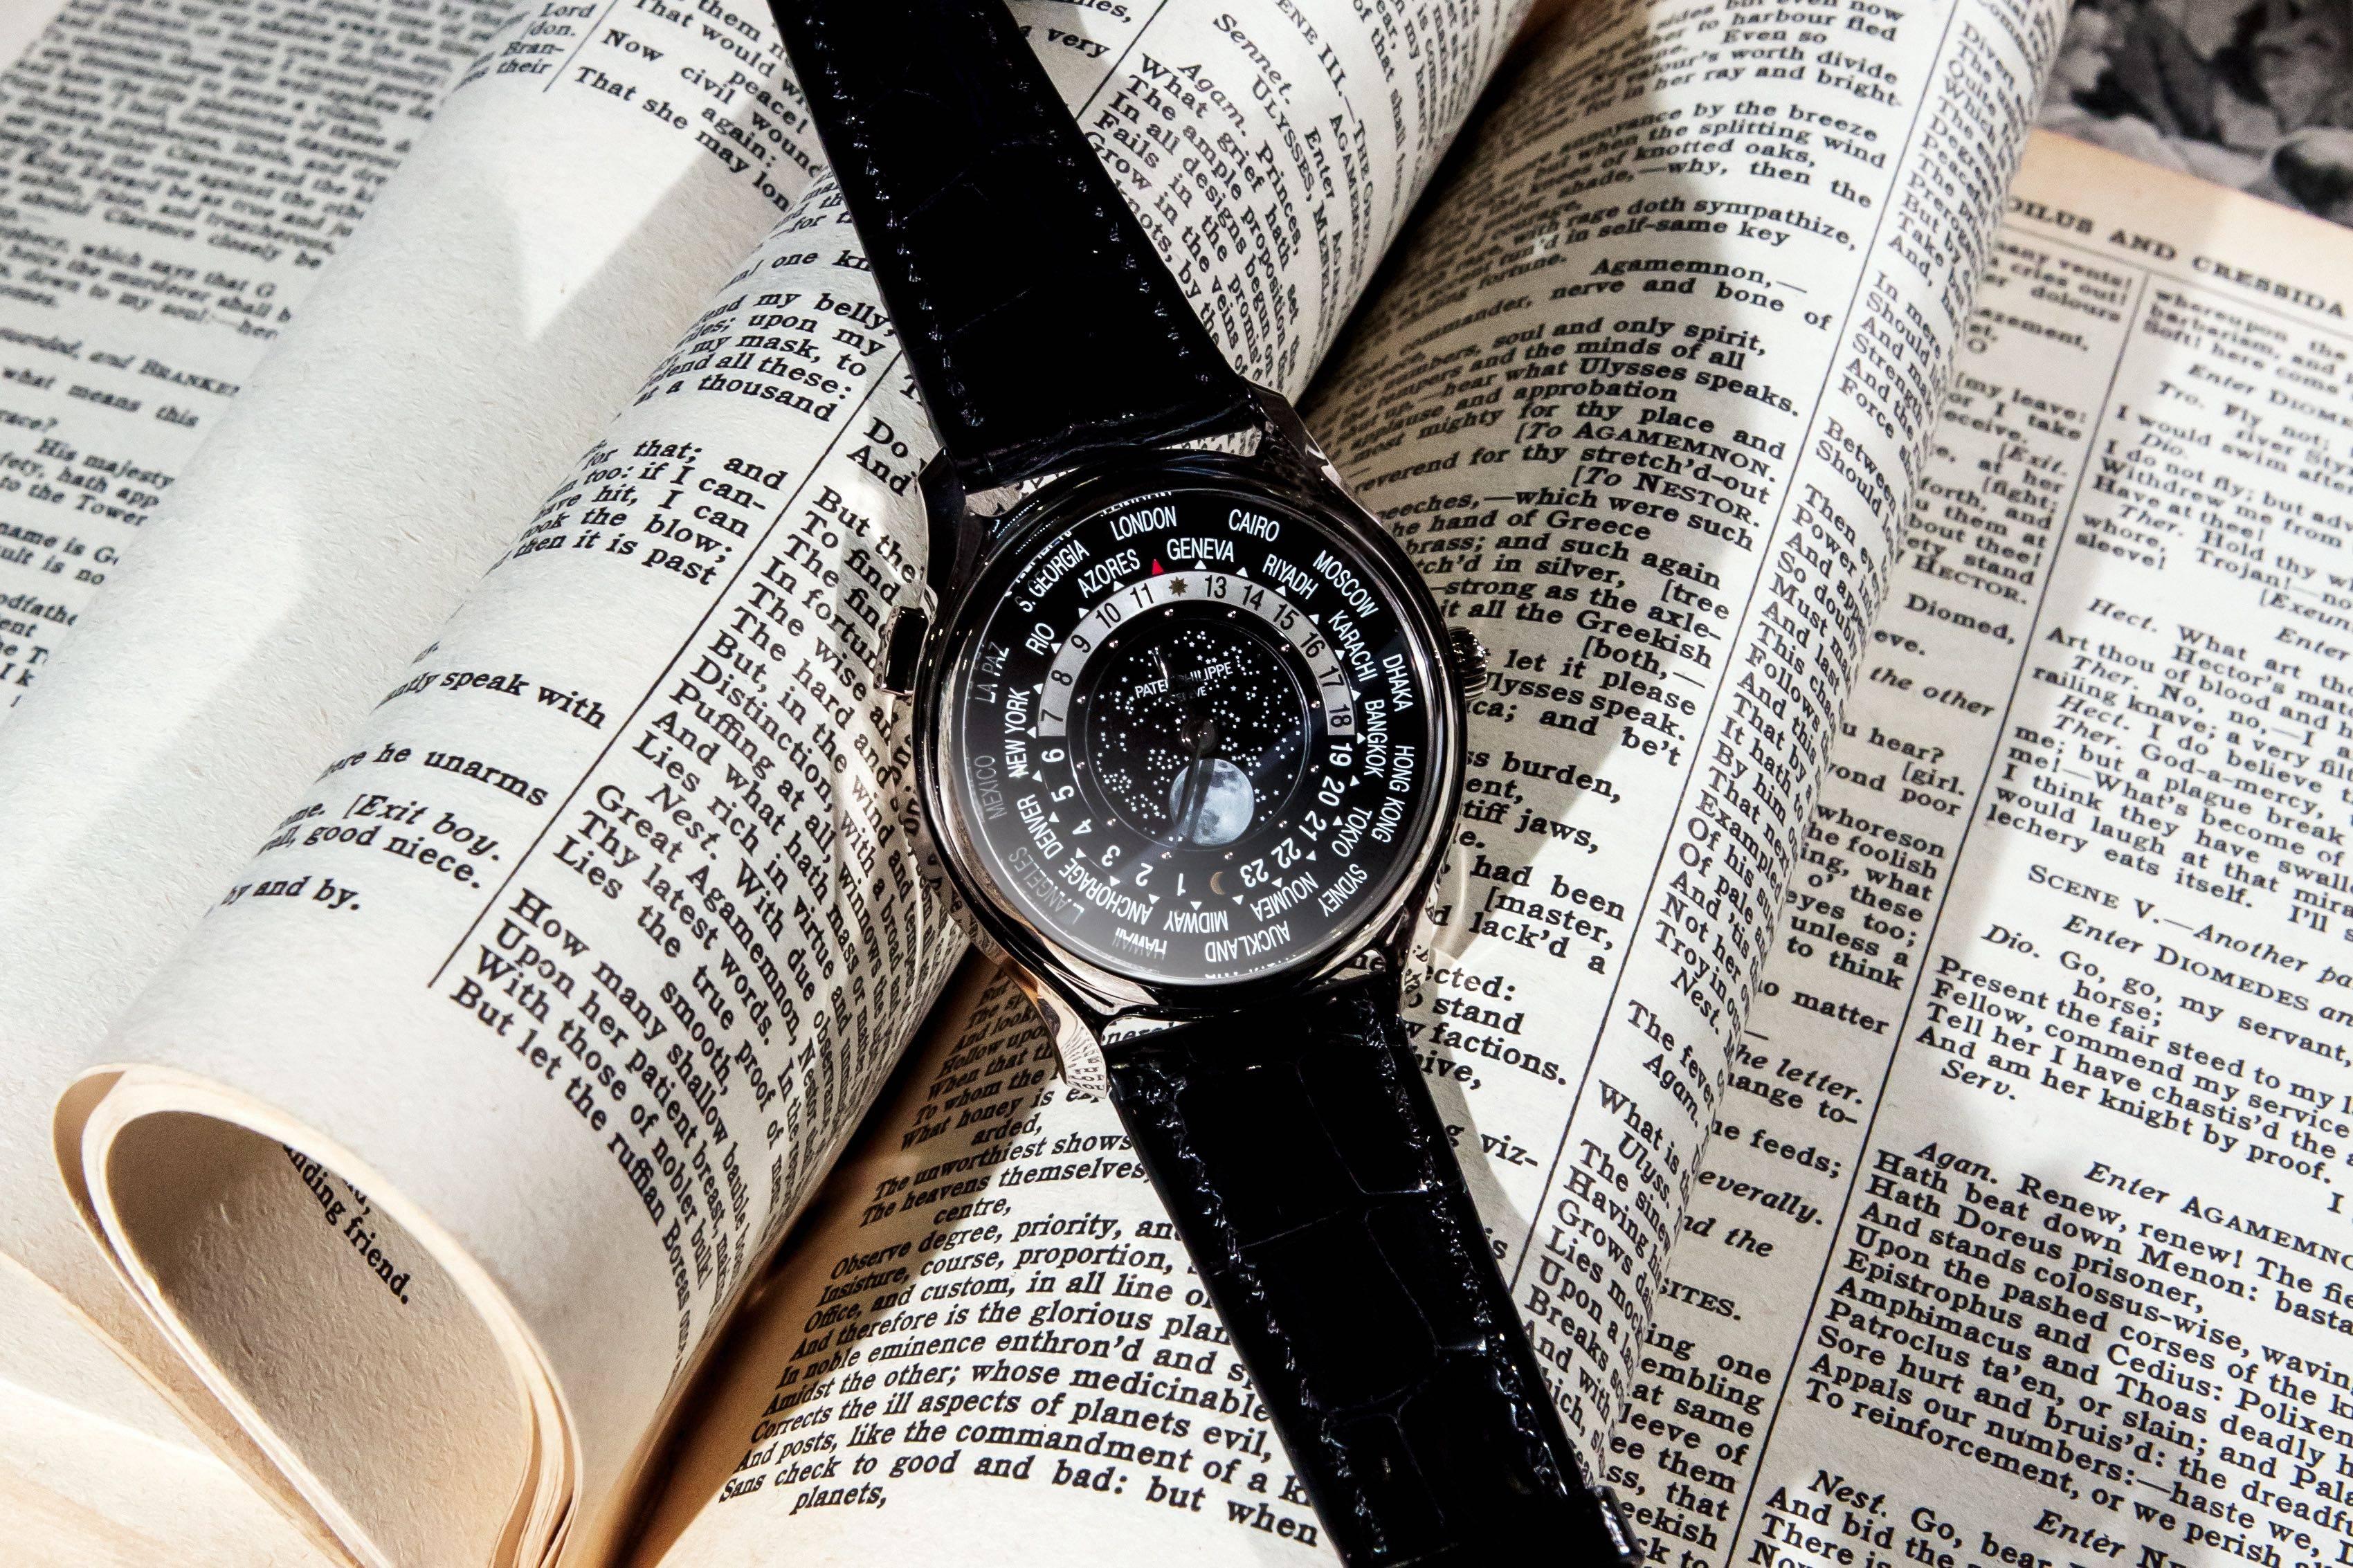 Patek Philippe World Time Moon Ref. 5575/7175 watch